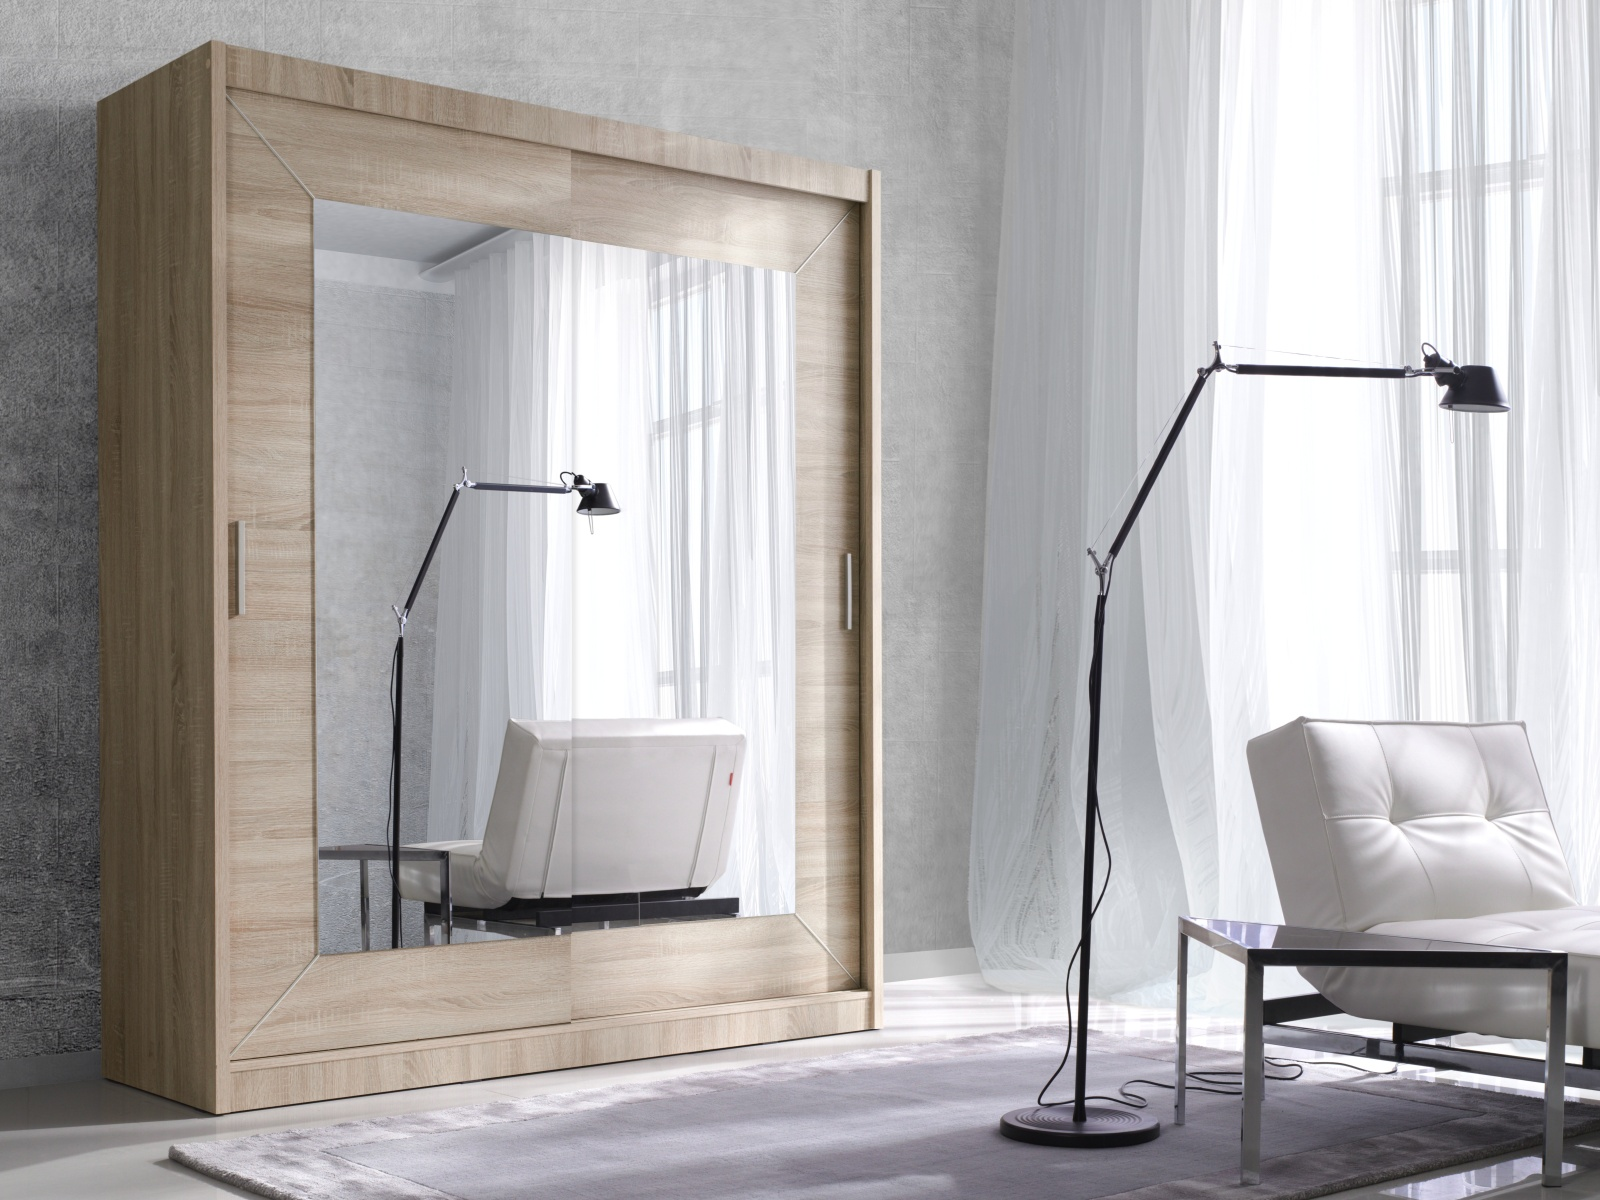 Smartshop ALFA šatní skříň se zrcadlem 200 TYP 18, dub sonoma světlý